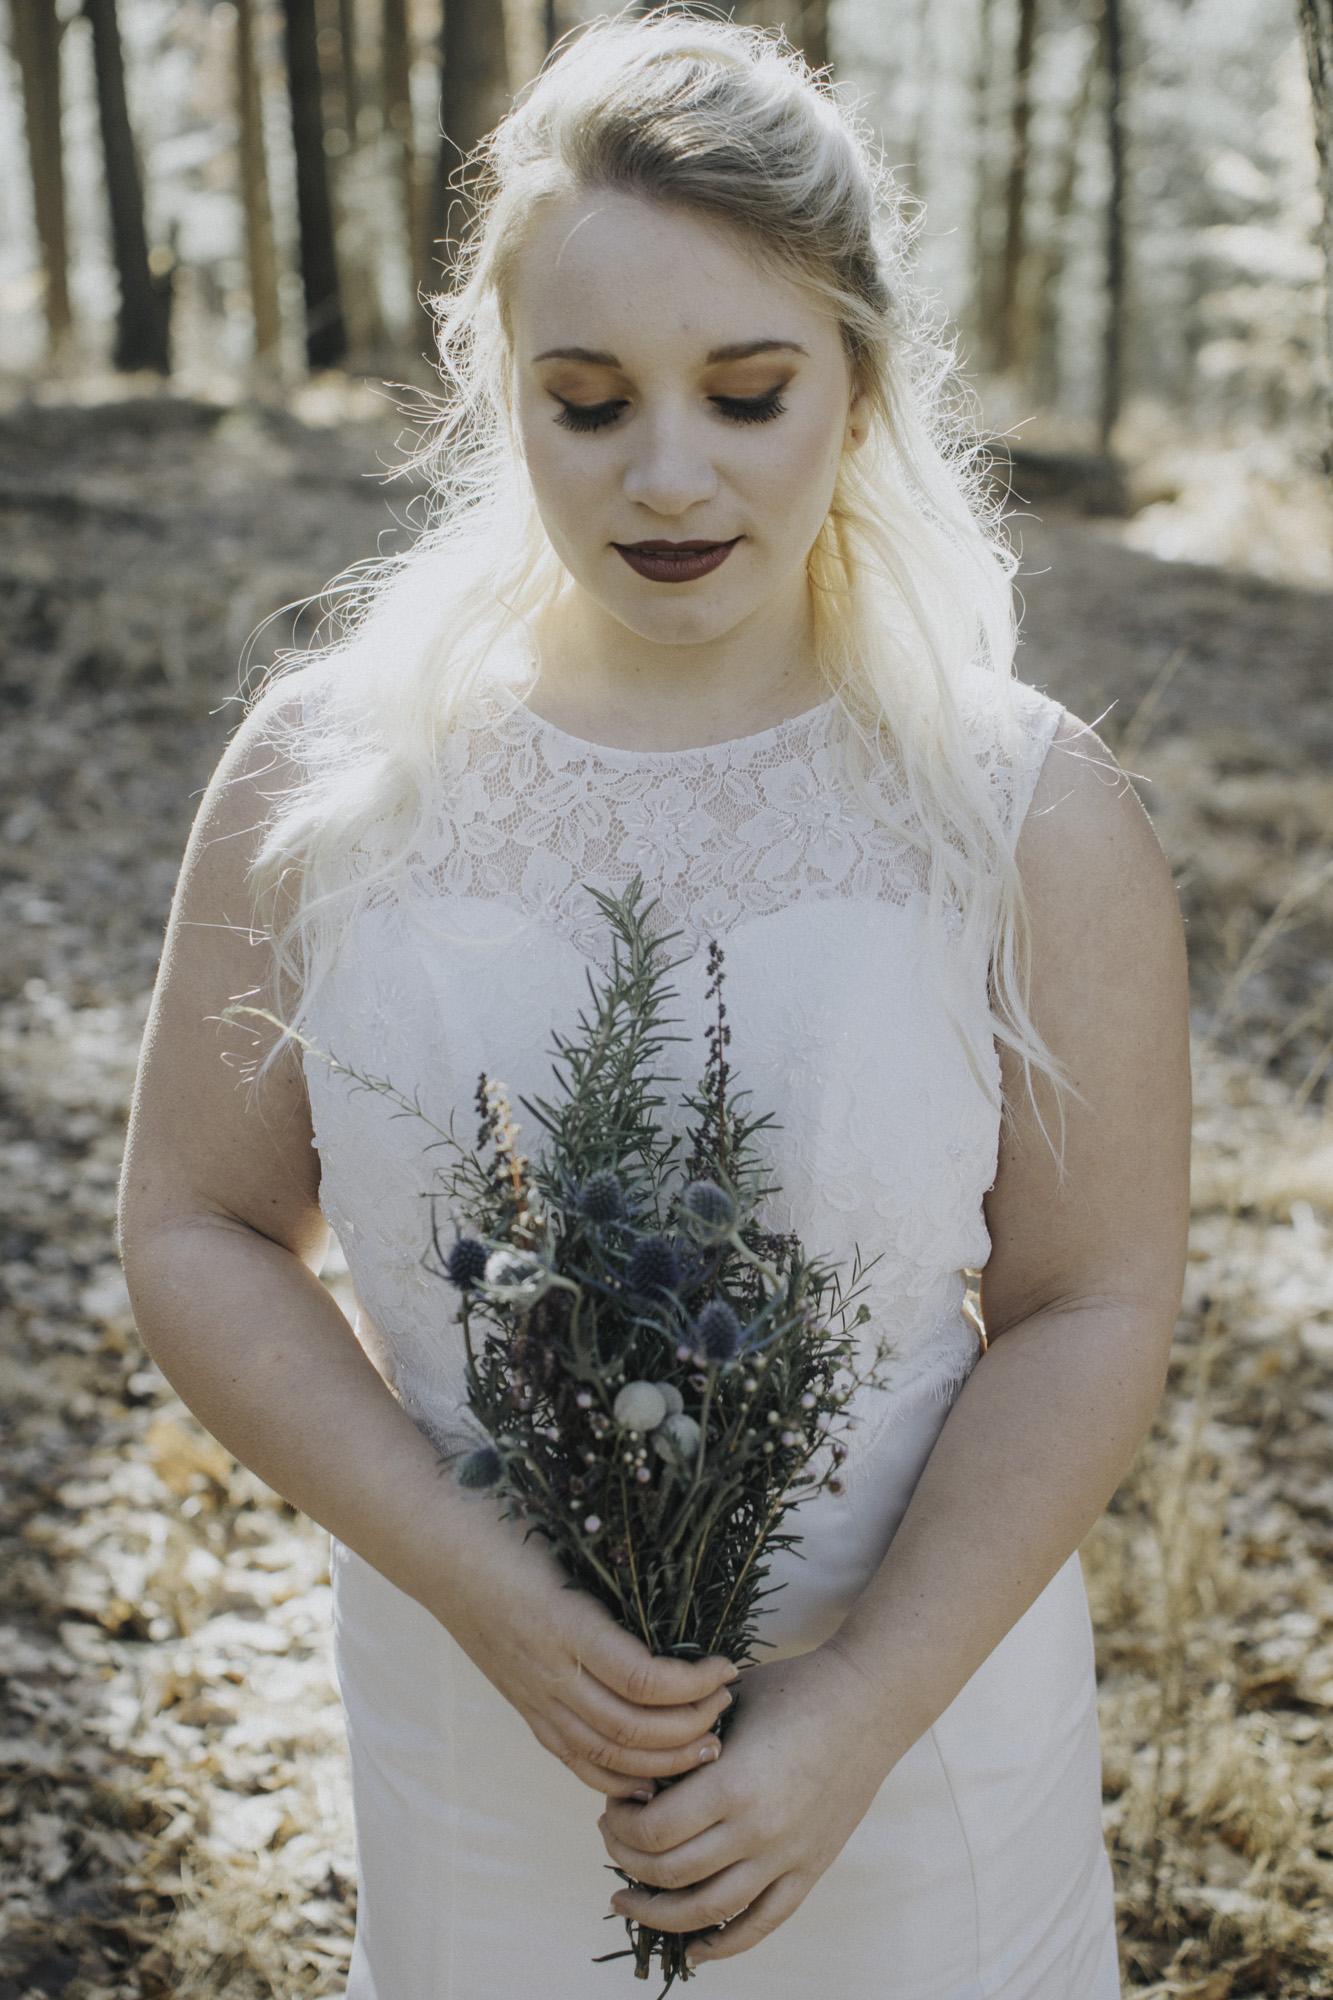 Cate_Ann_Photography_Dayton_Ohio_Wedding_Elopement_And_Engagement_PhotographerDSC_6396.jpg